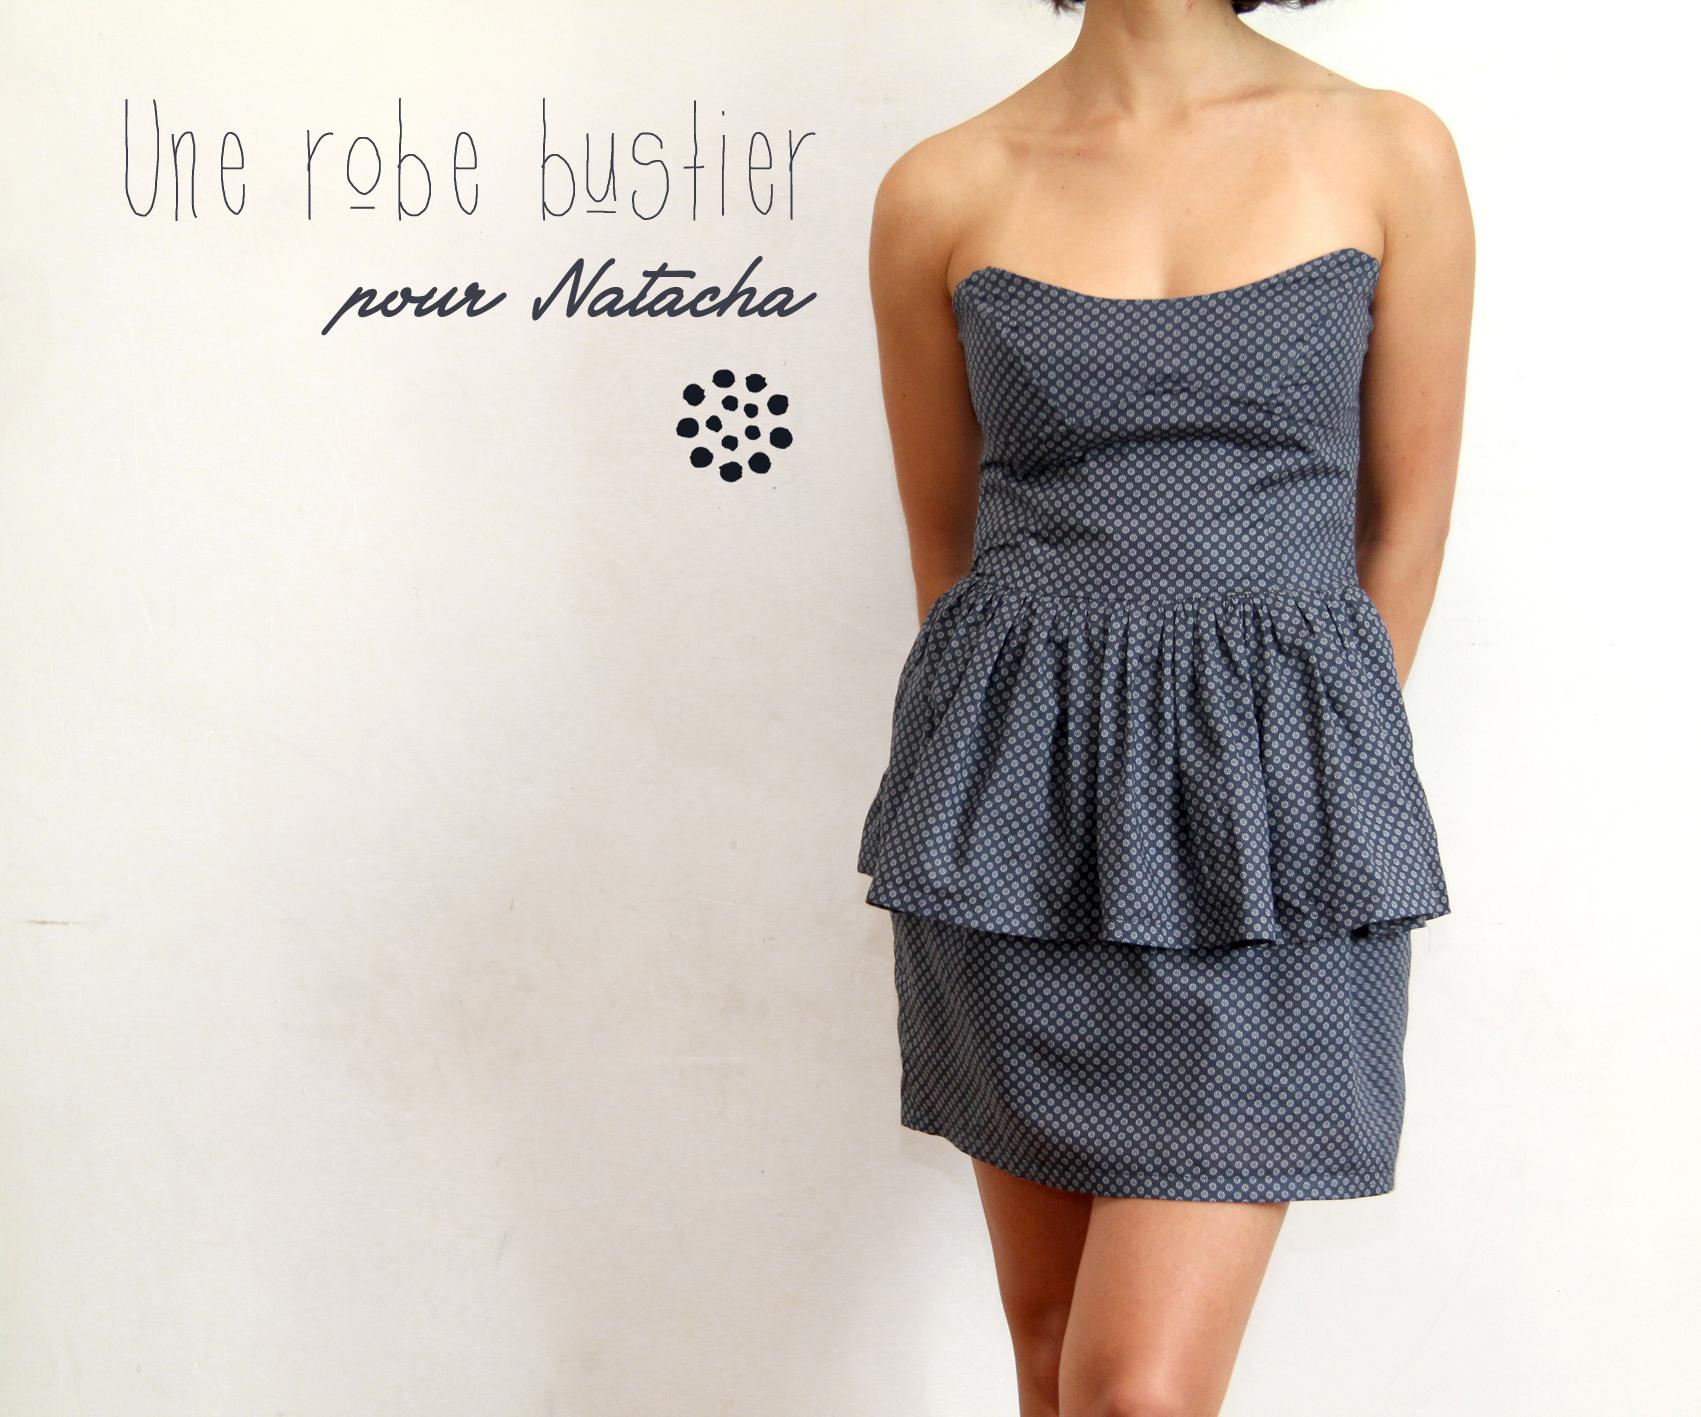 Patron couture pour robe bustier